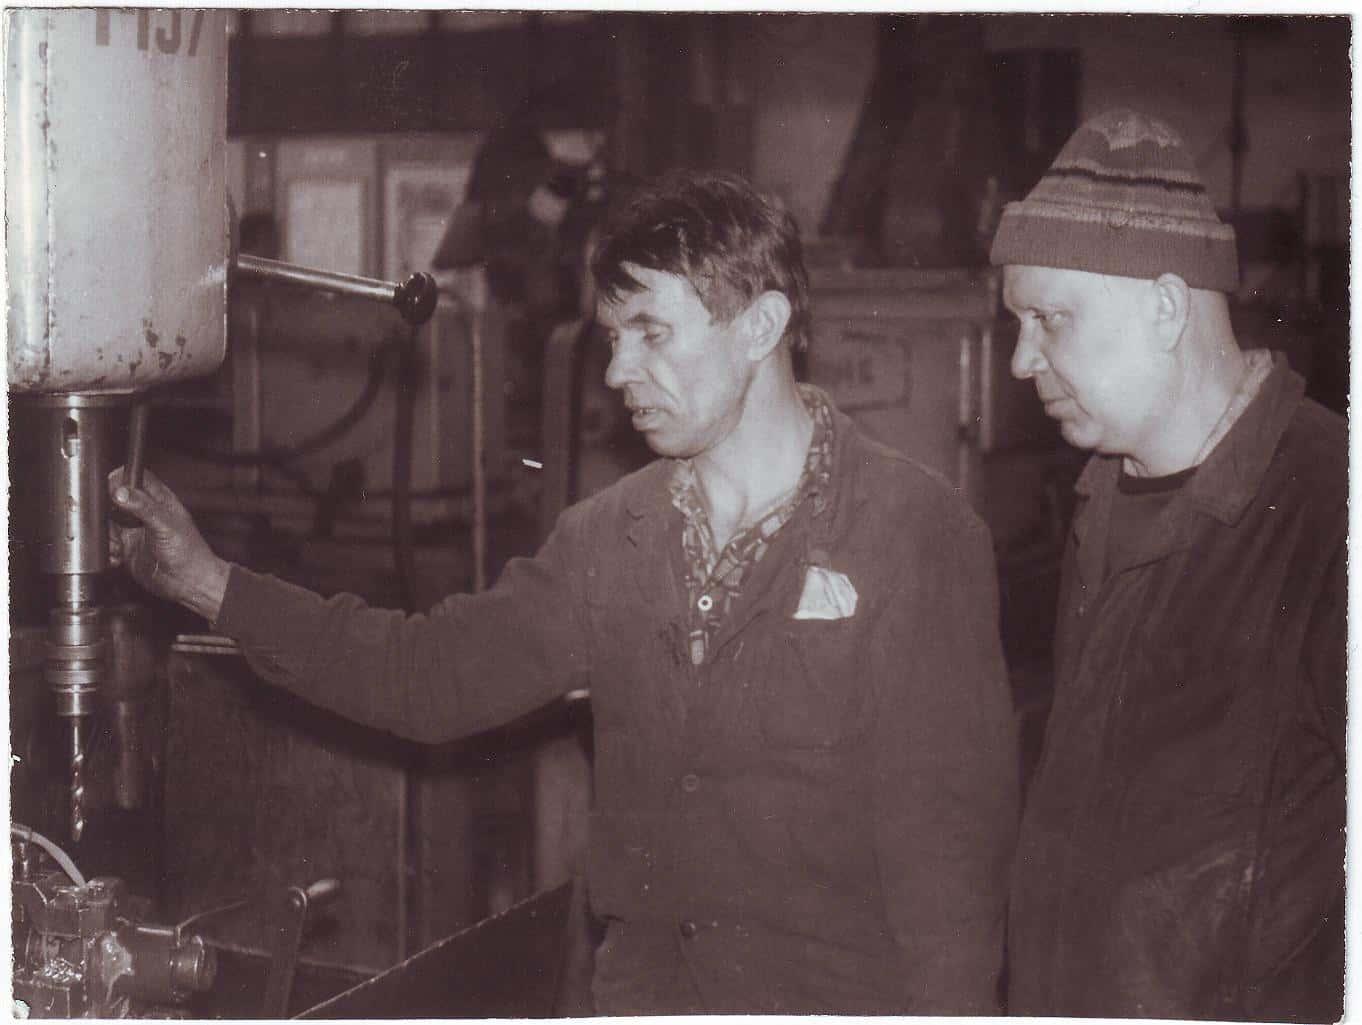 Фото из личного архива Олега Мошникова